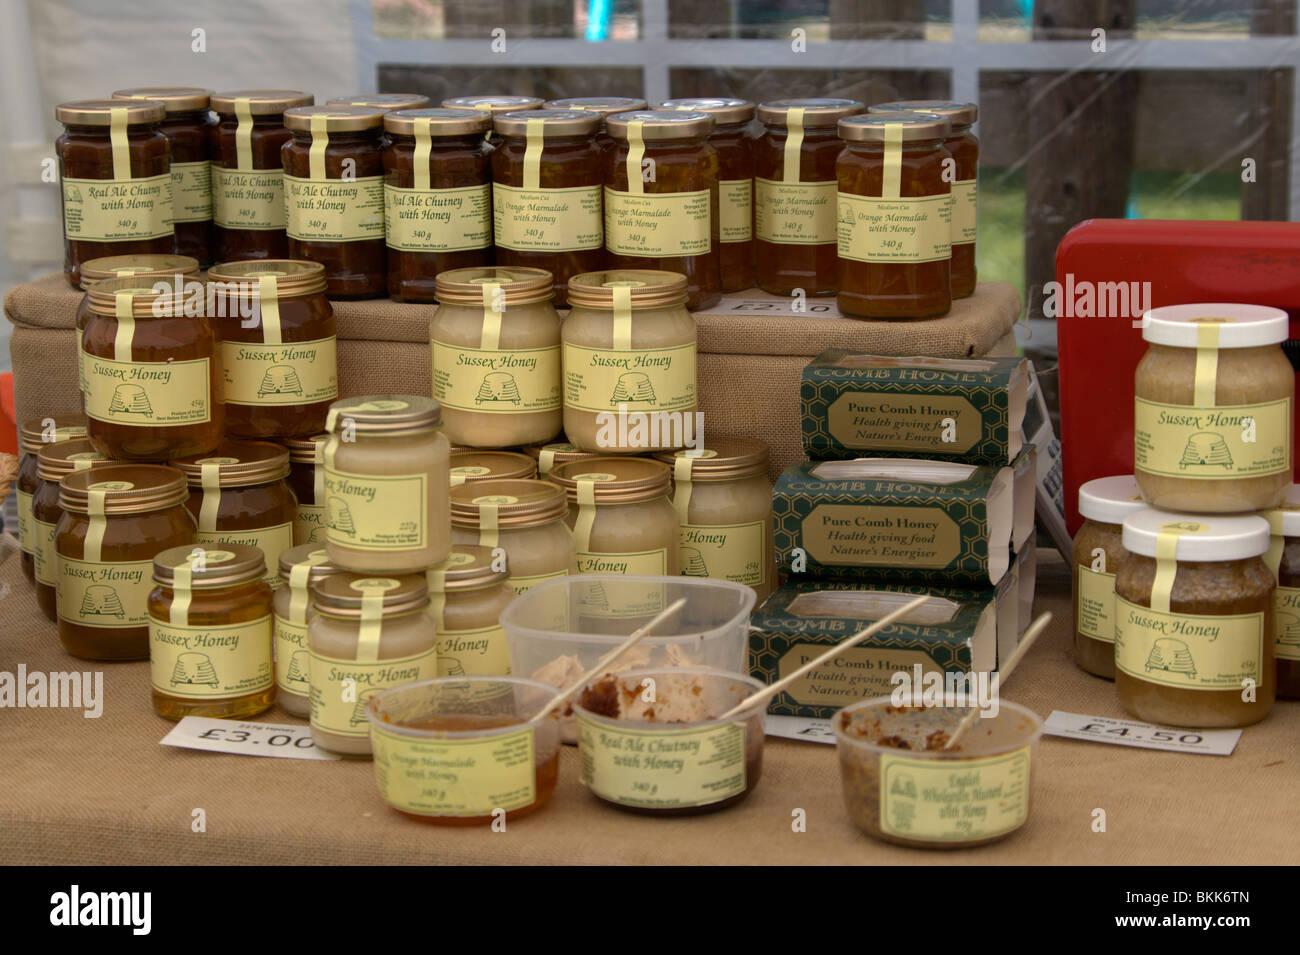 Honey supplier Stock Photo: 29311317 - Alamy